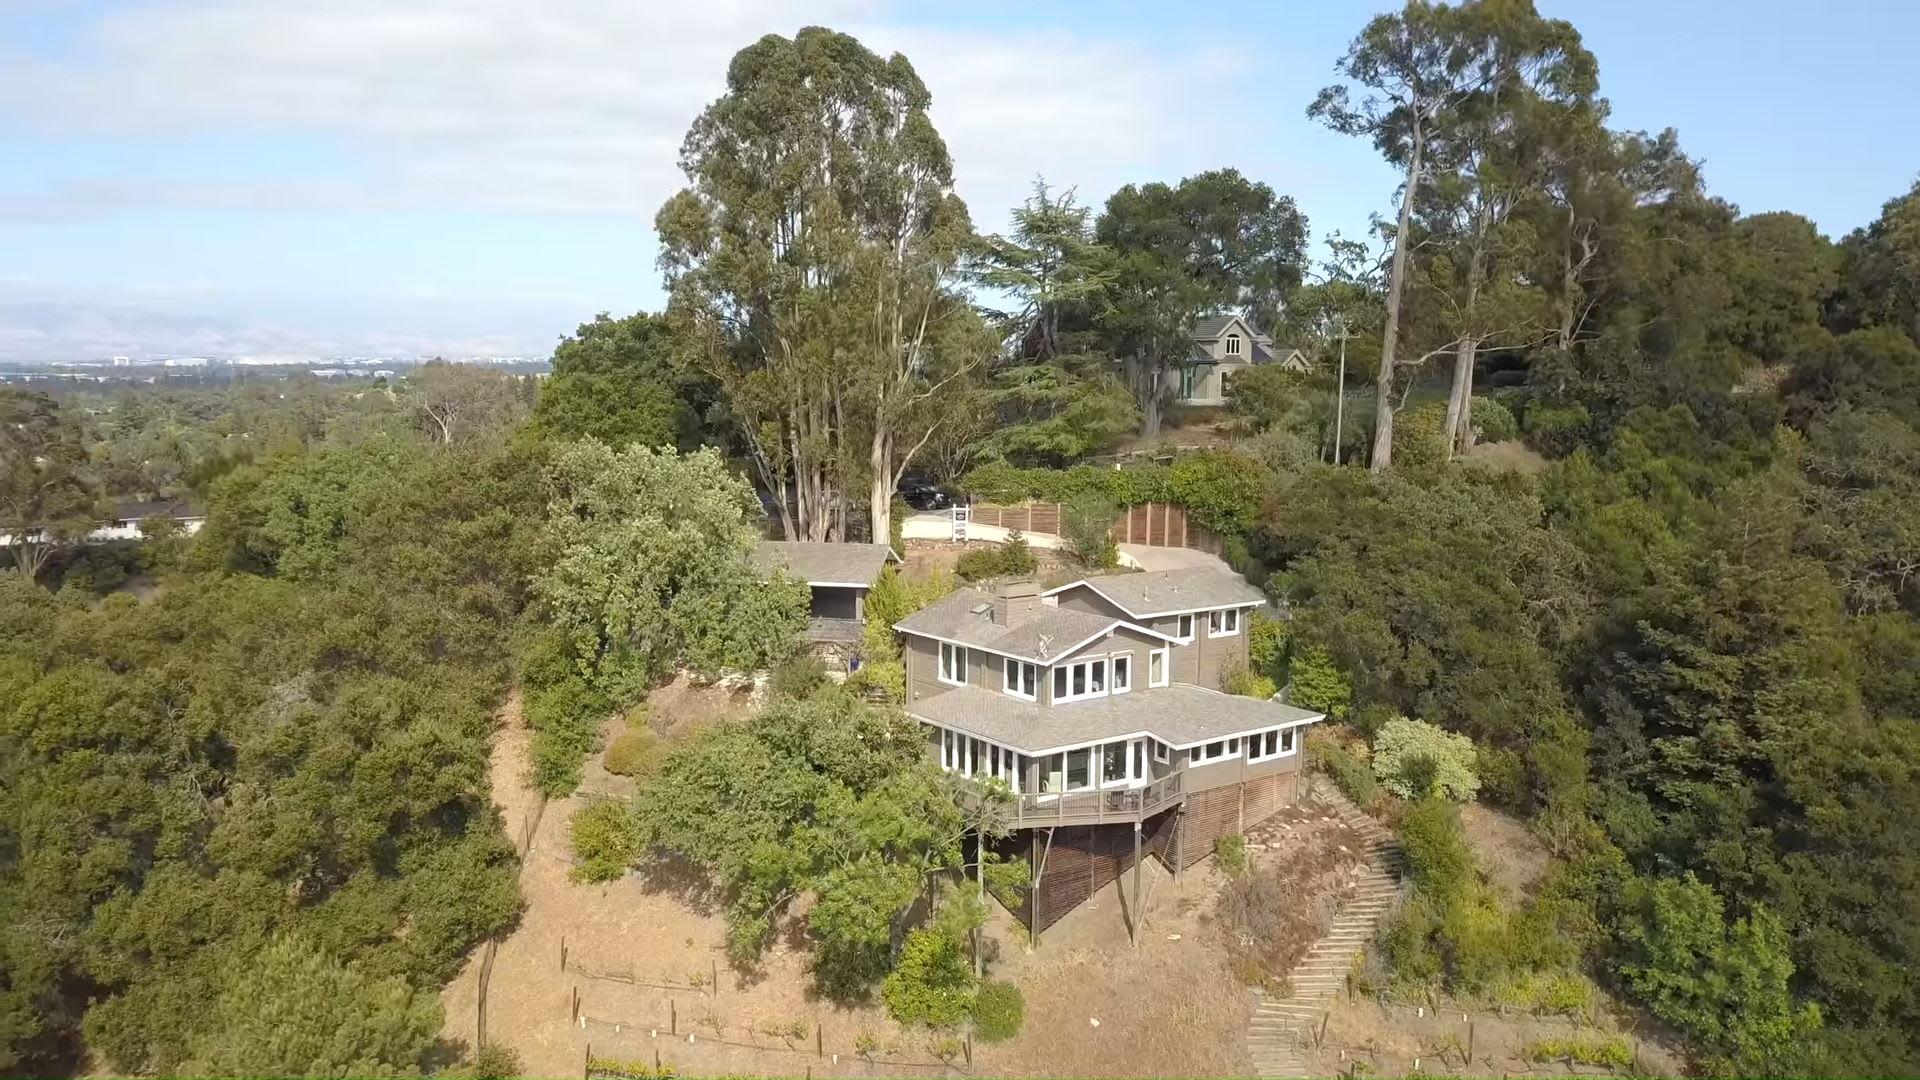 13349 La Cresta Dr, Los Altos Hills, CA 94022 video preview